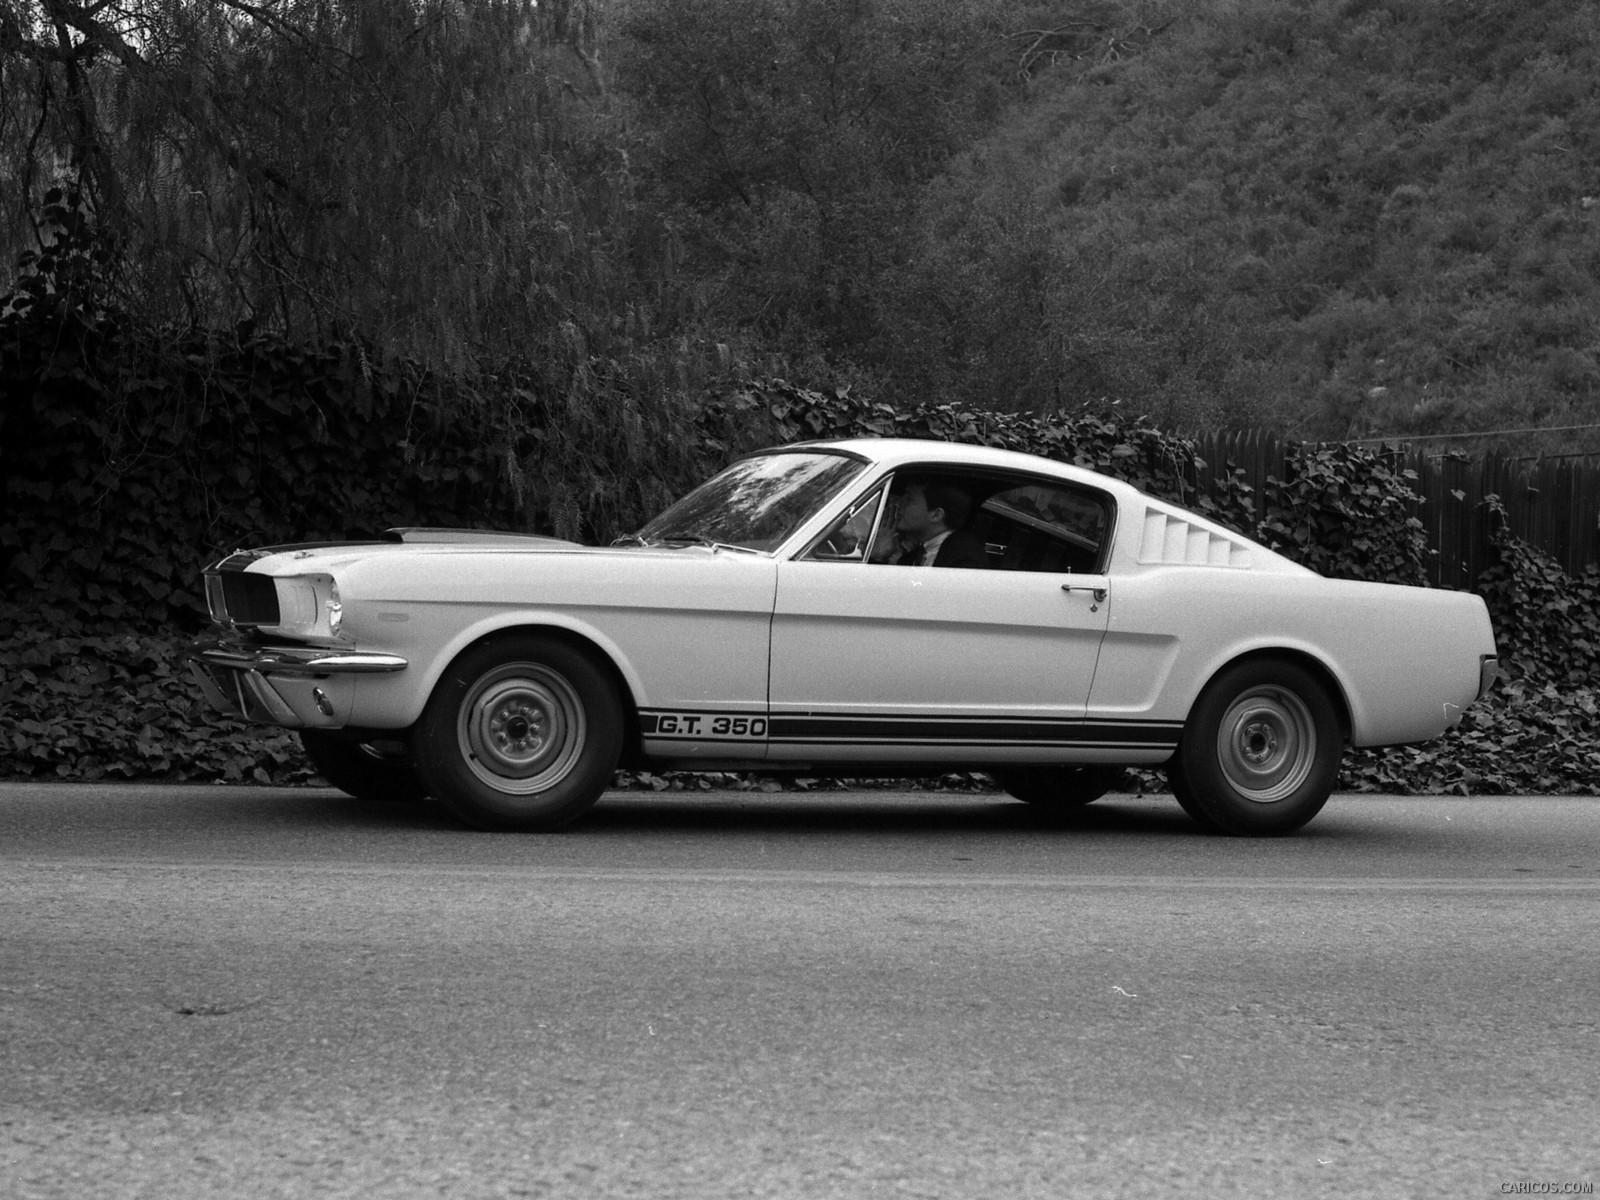 Ford Mustang Shelby GT350 2k duvarkağıdı